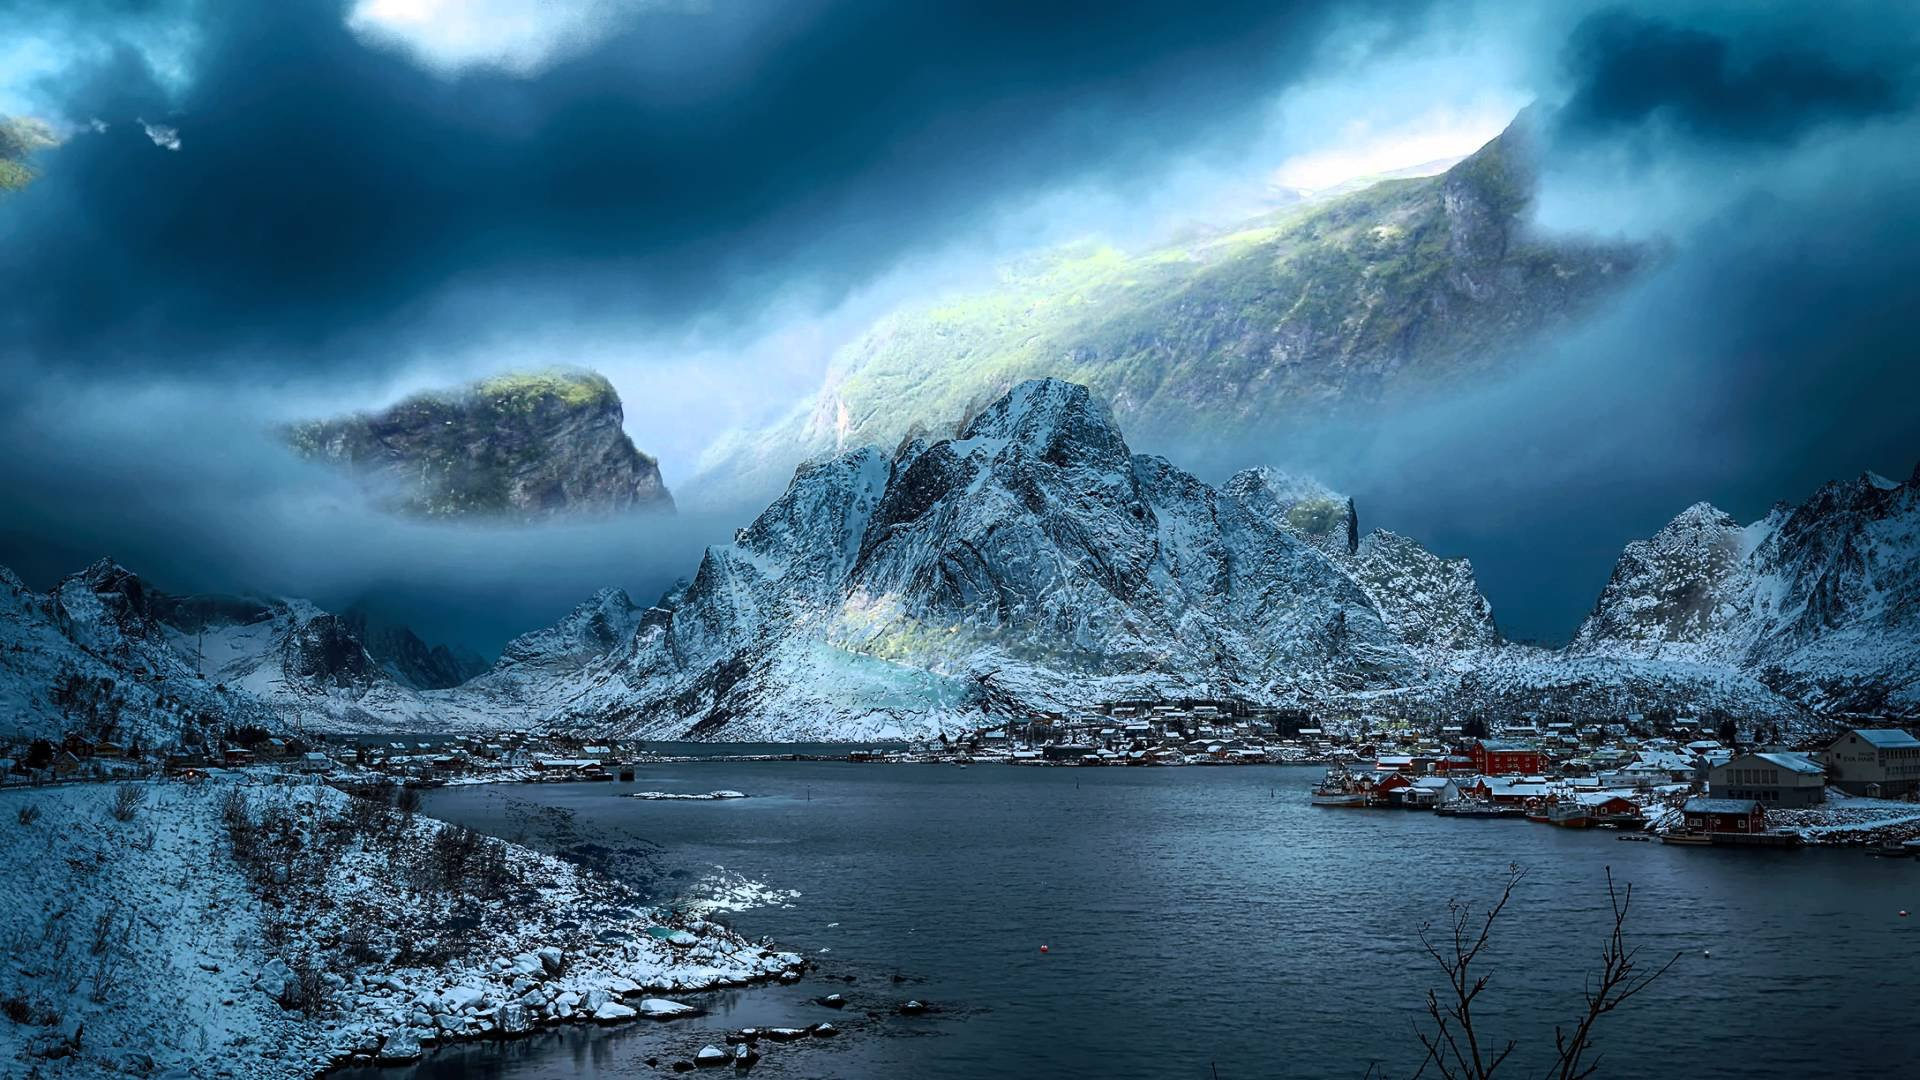 Mass Effect Fall Wallpaper Fjords Norway Hd Wallpaper